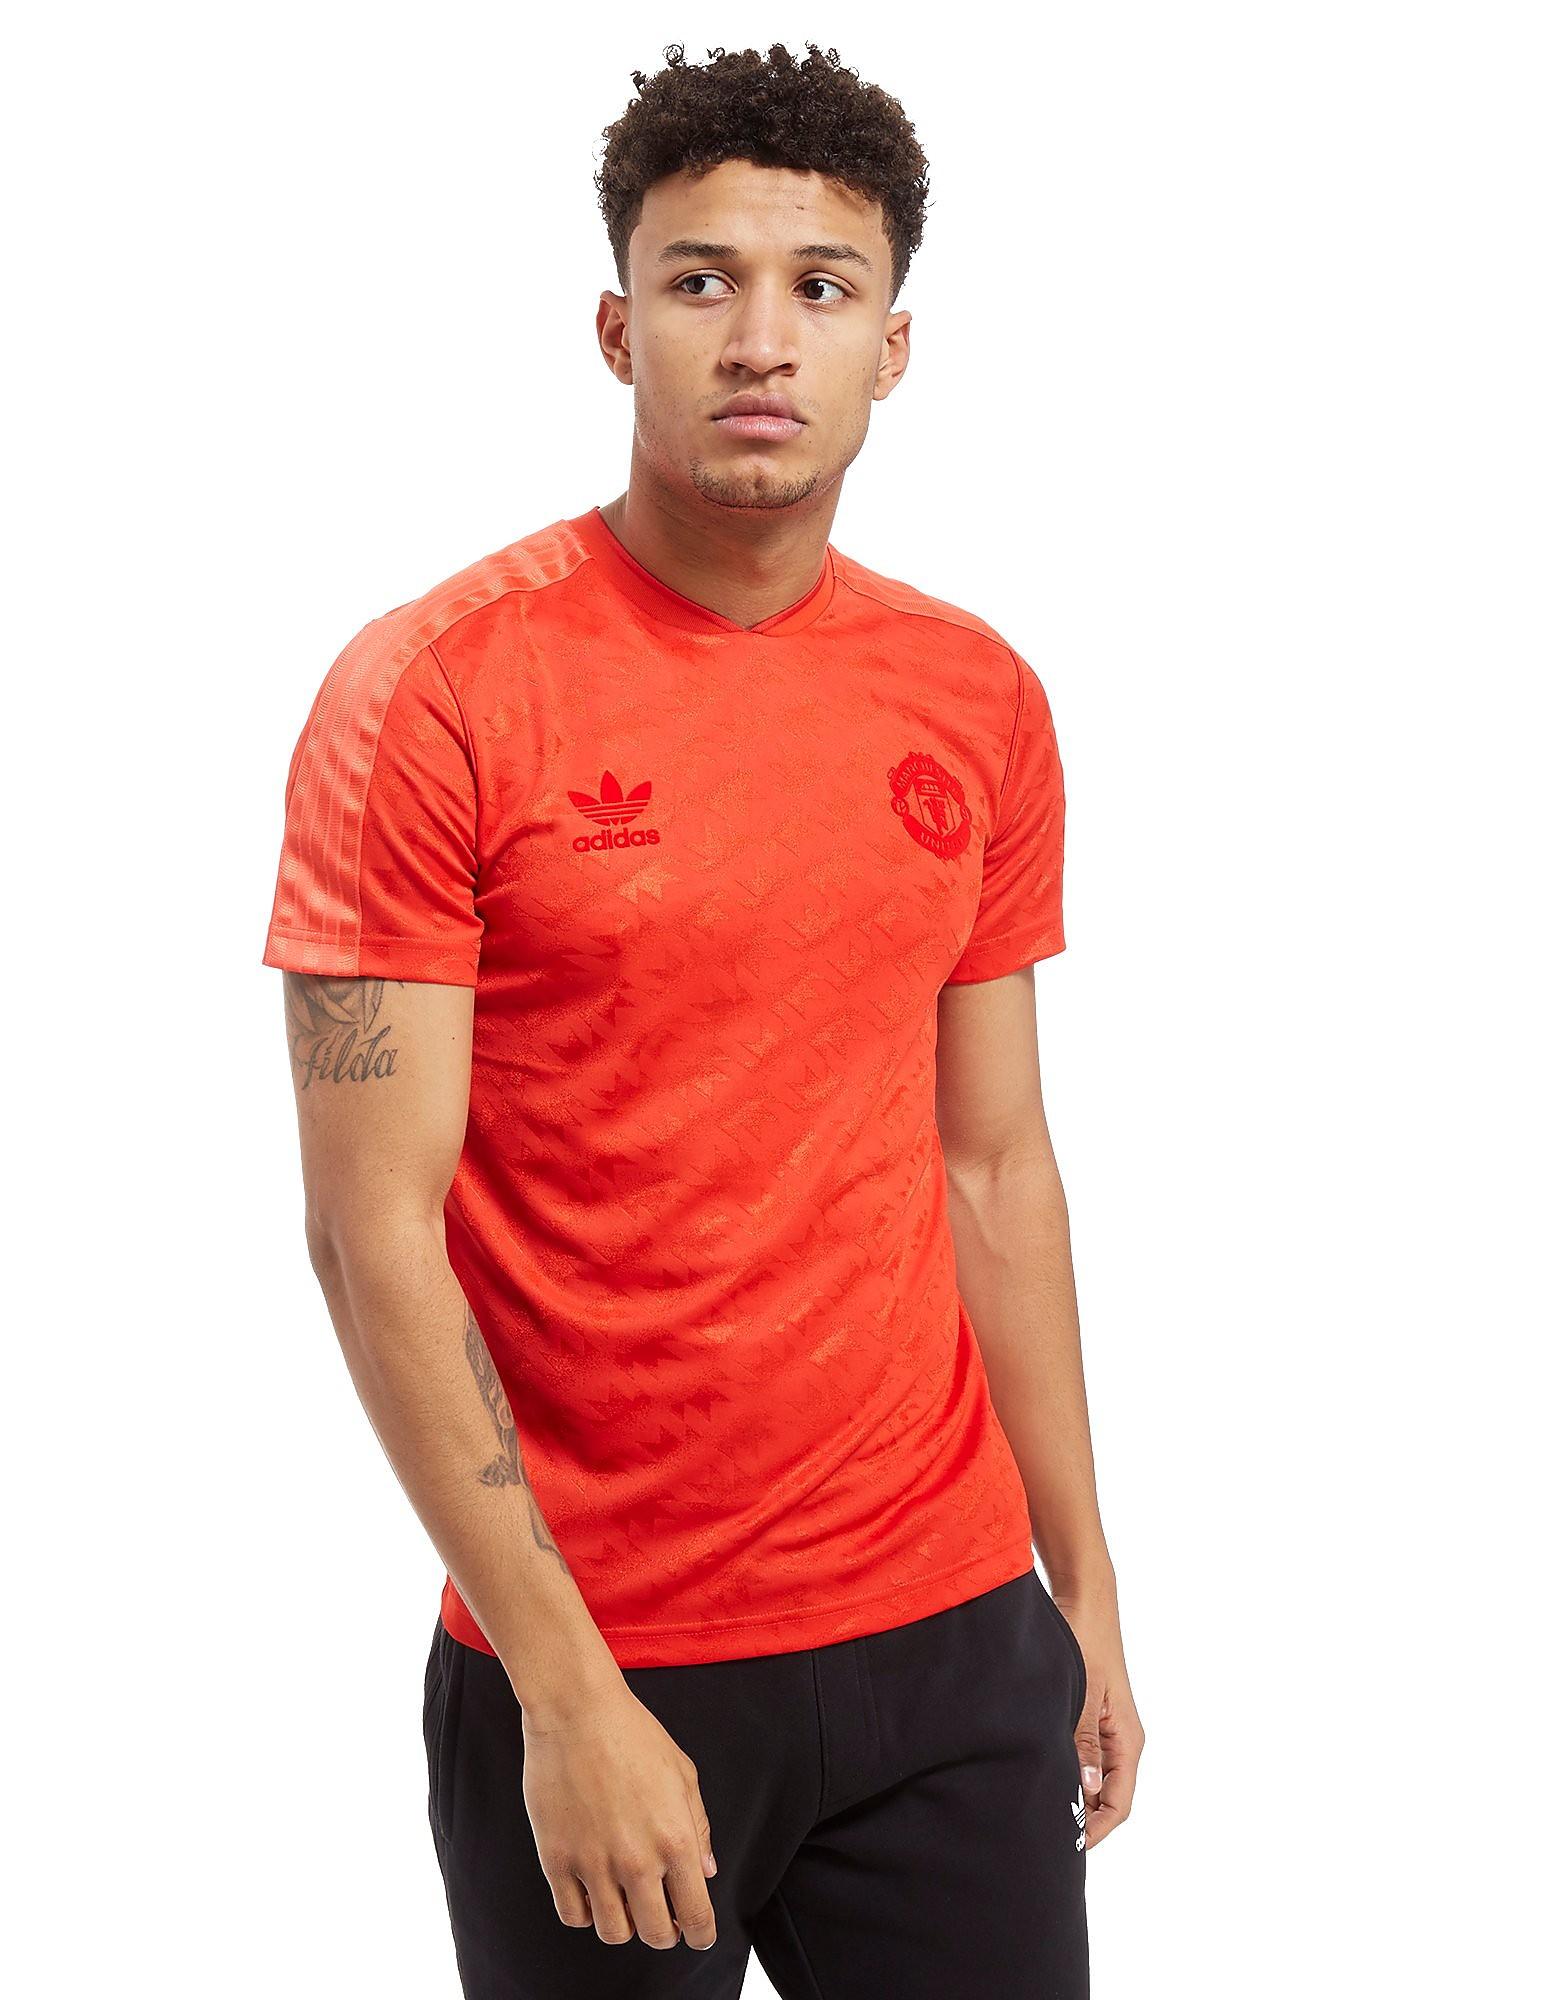 adidas Originals Manchester United 2017 T-Shirt